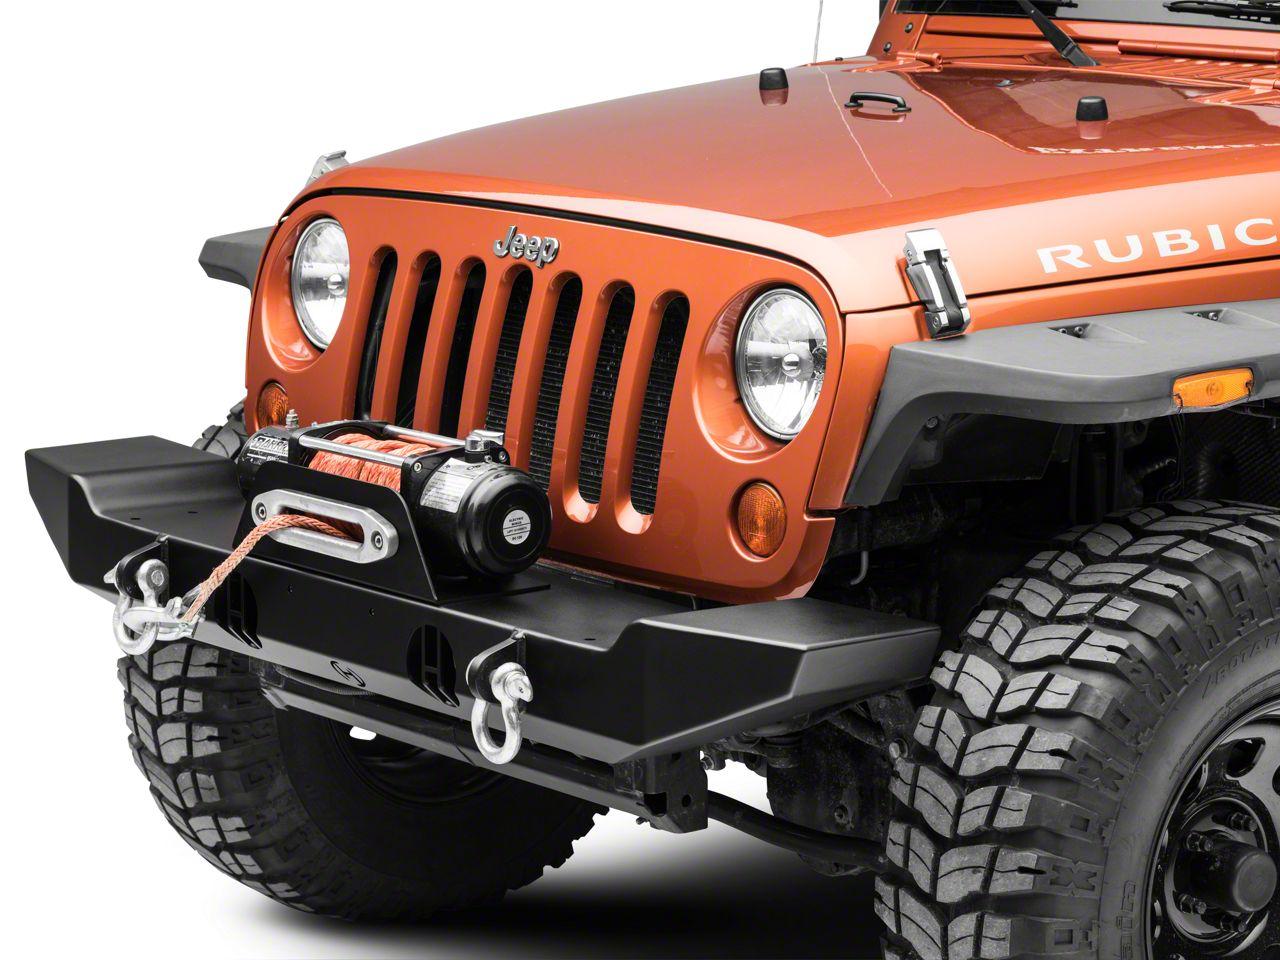 Add Hyline Offroad Standard Front Bumper Assembly (07-17 Wrangler JK)